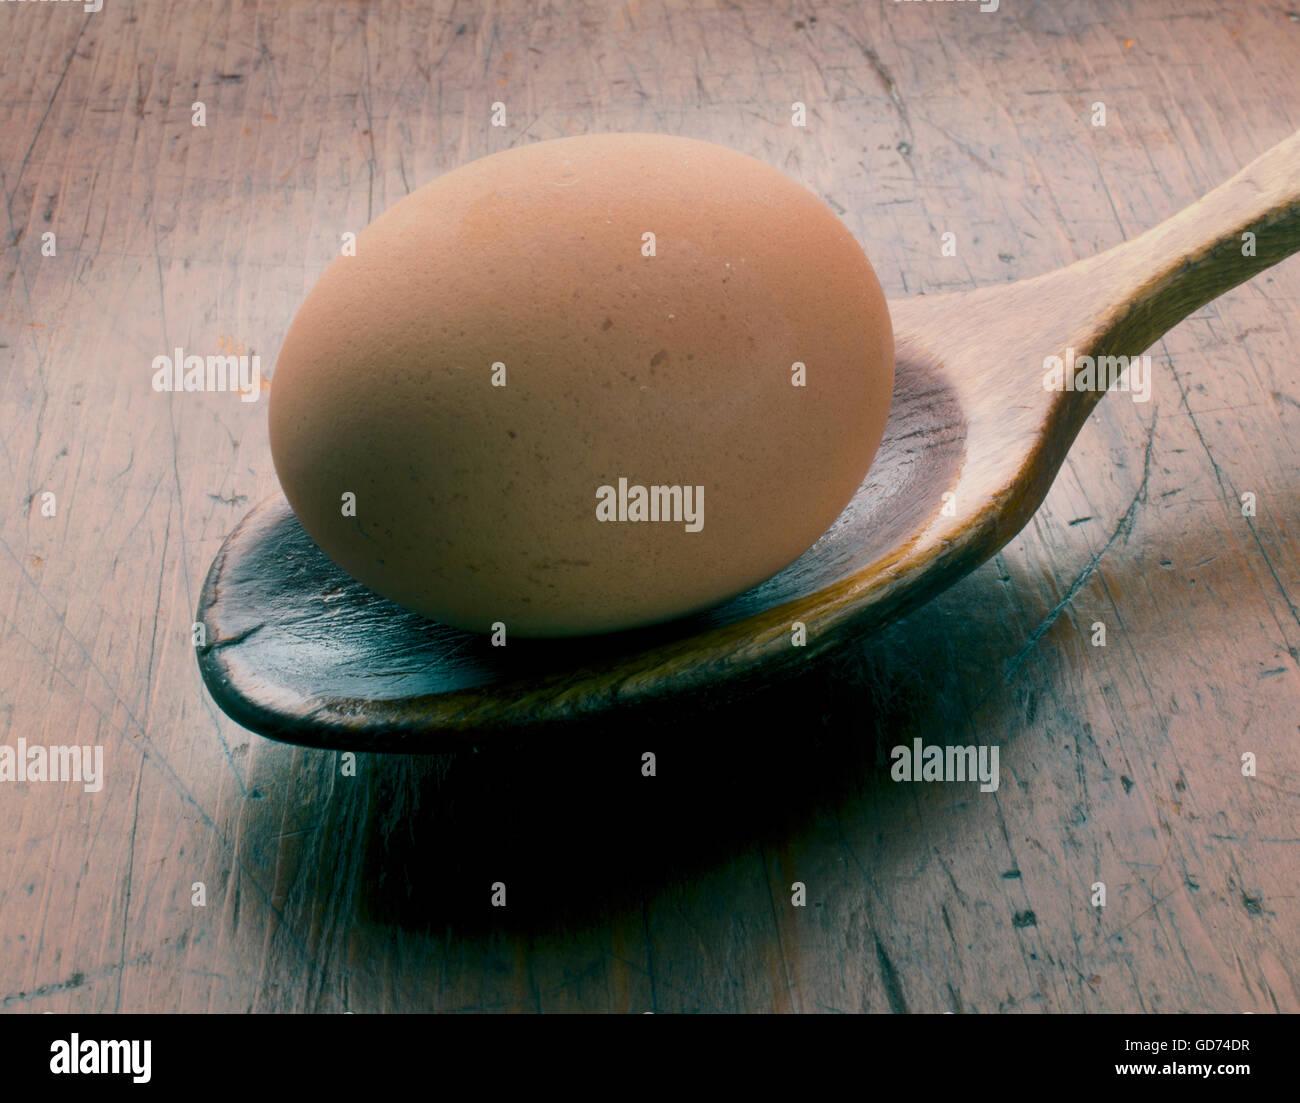 cuchara de madera de huevo Imagen De Stock